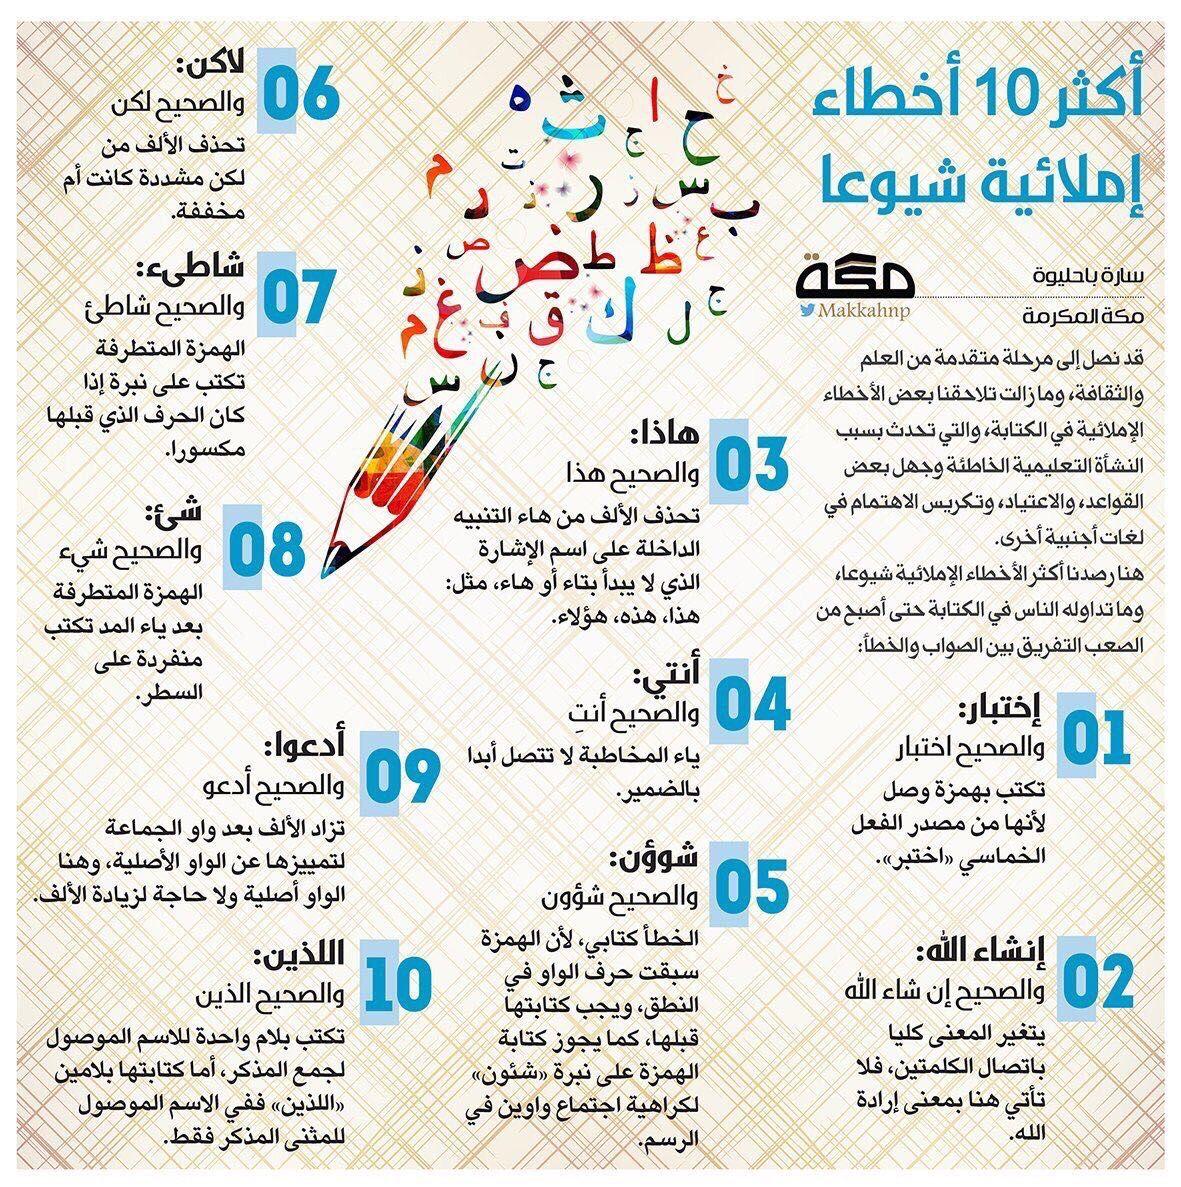 Pin By Jouria Warda On أحلي الكلمات Bullet Journal Education Arabic Poetry